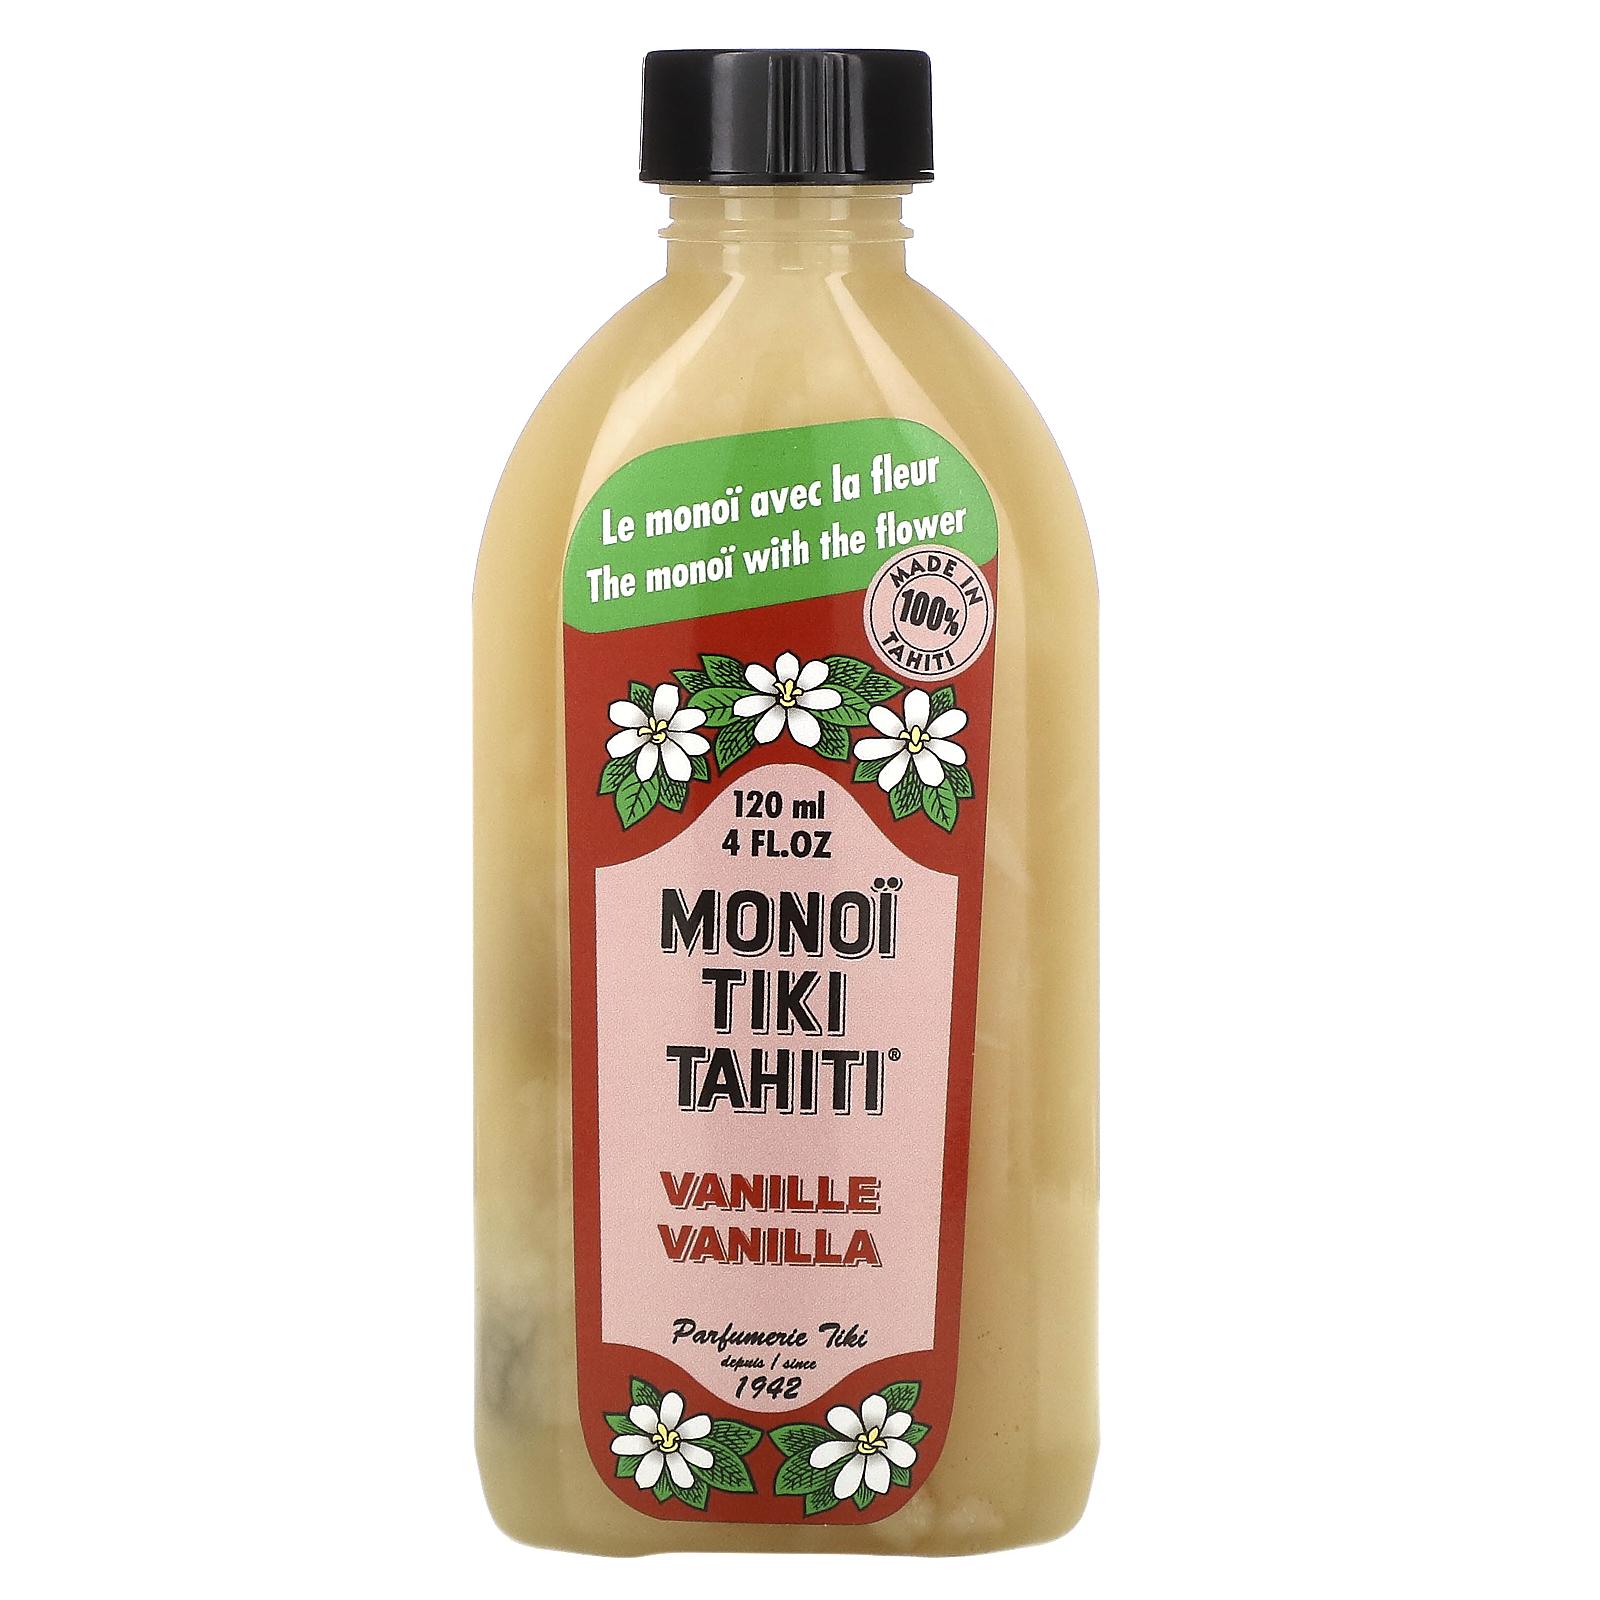 12+ Monoi Tiare Tahiti, Coconut Oil, Vanilla, 8 fl oz 8 ml   iHerb Fotografie